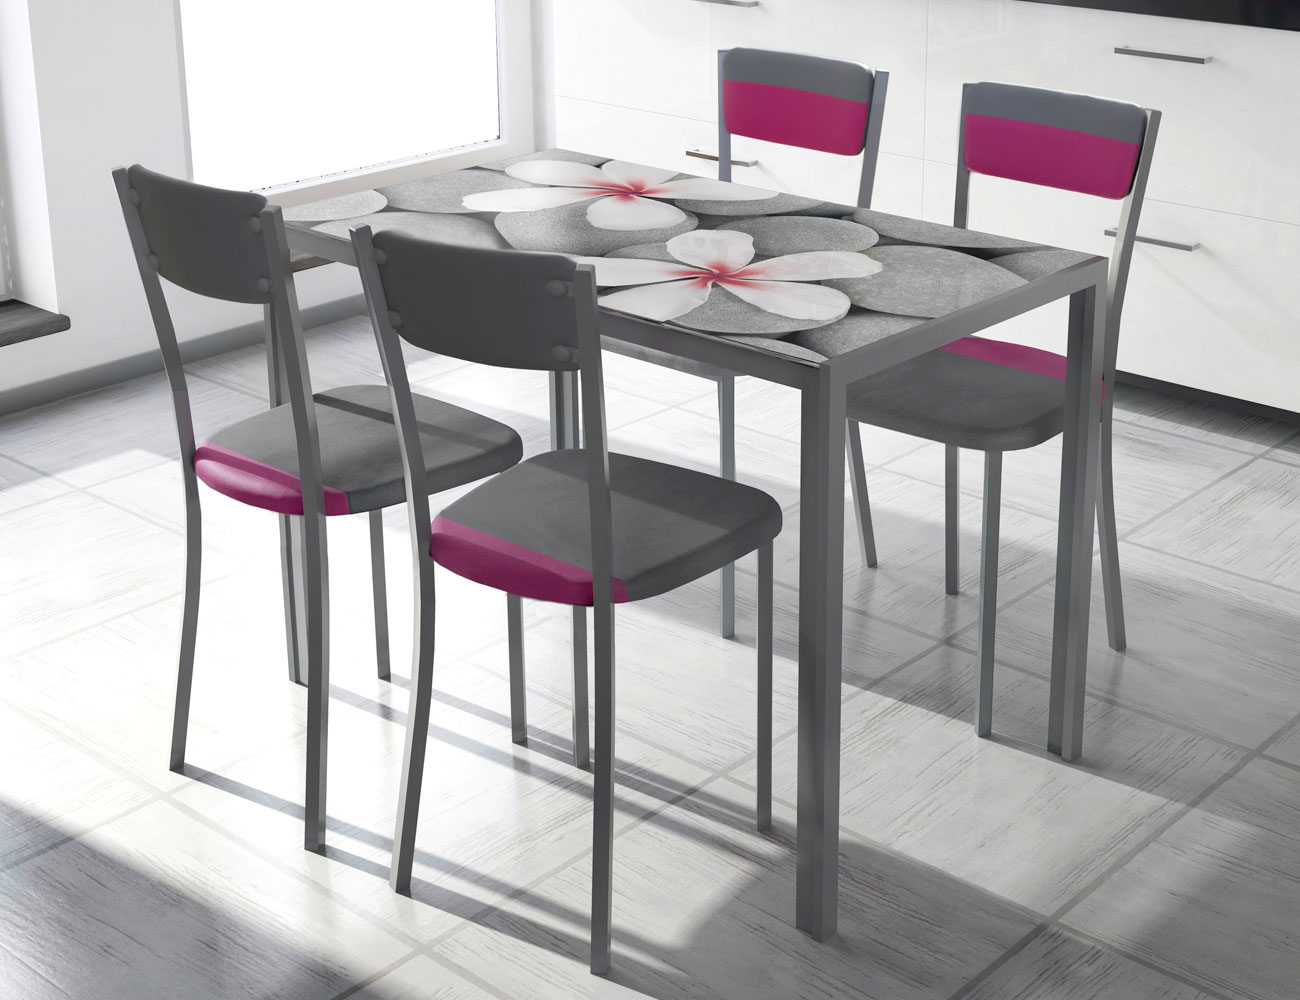 mesa de cocina con cristal templando serigrafiado 3546